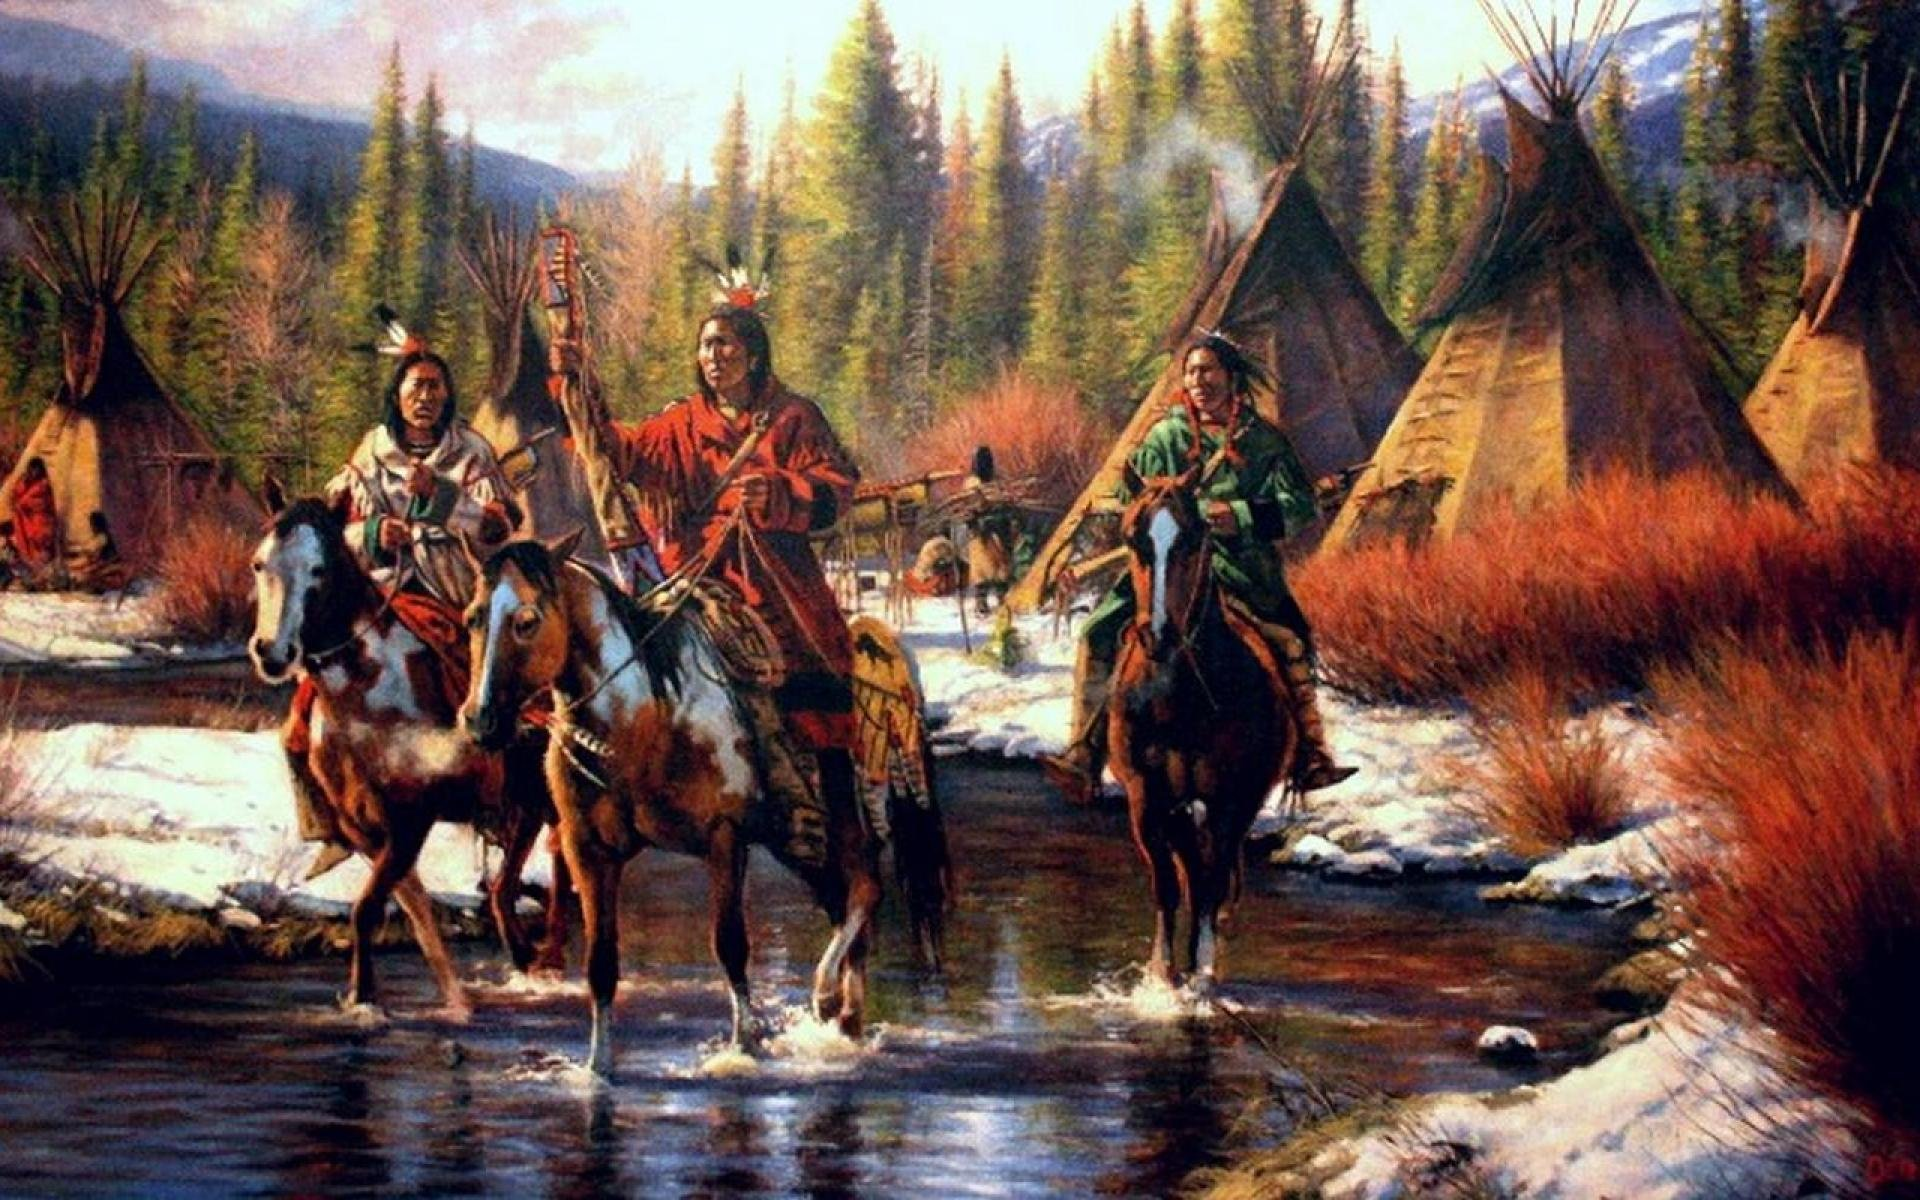 Native american indian western 55 wallpaper 1920x1200 416420 1920x1200